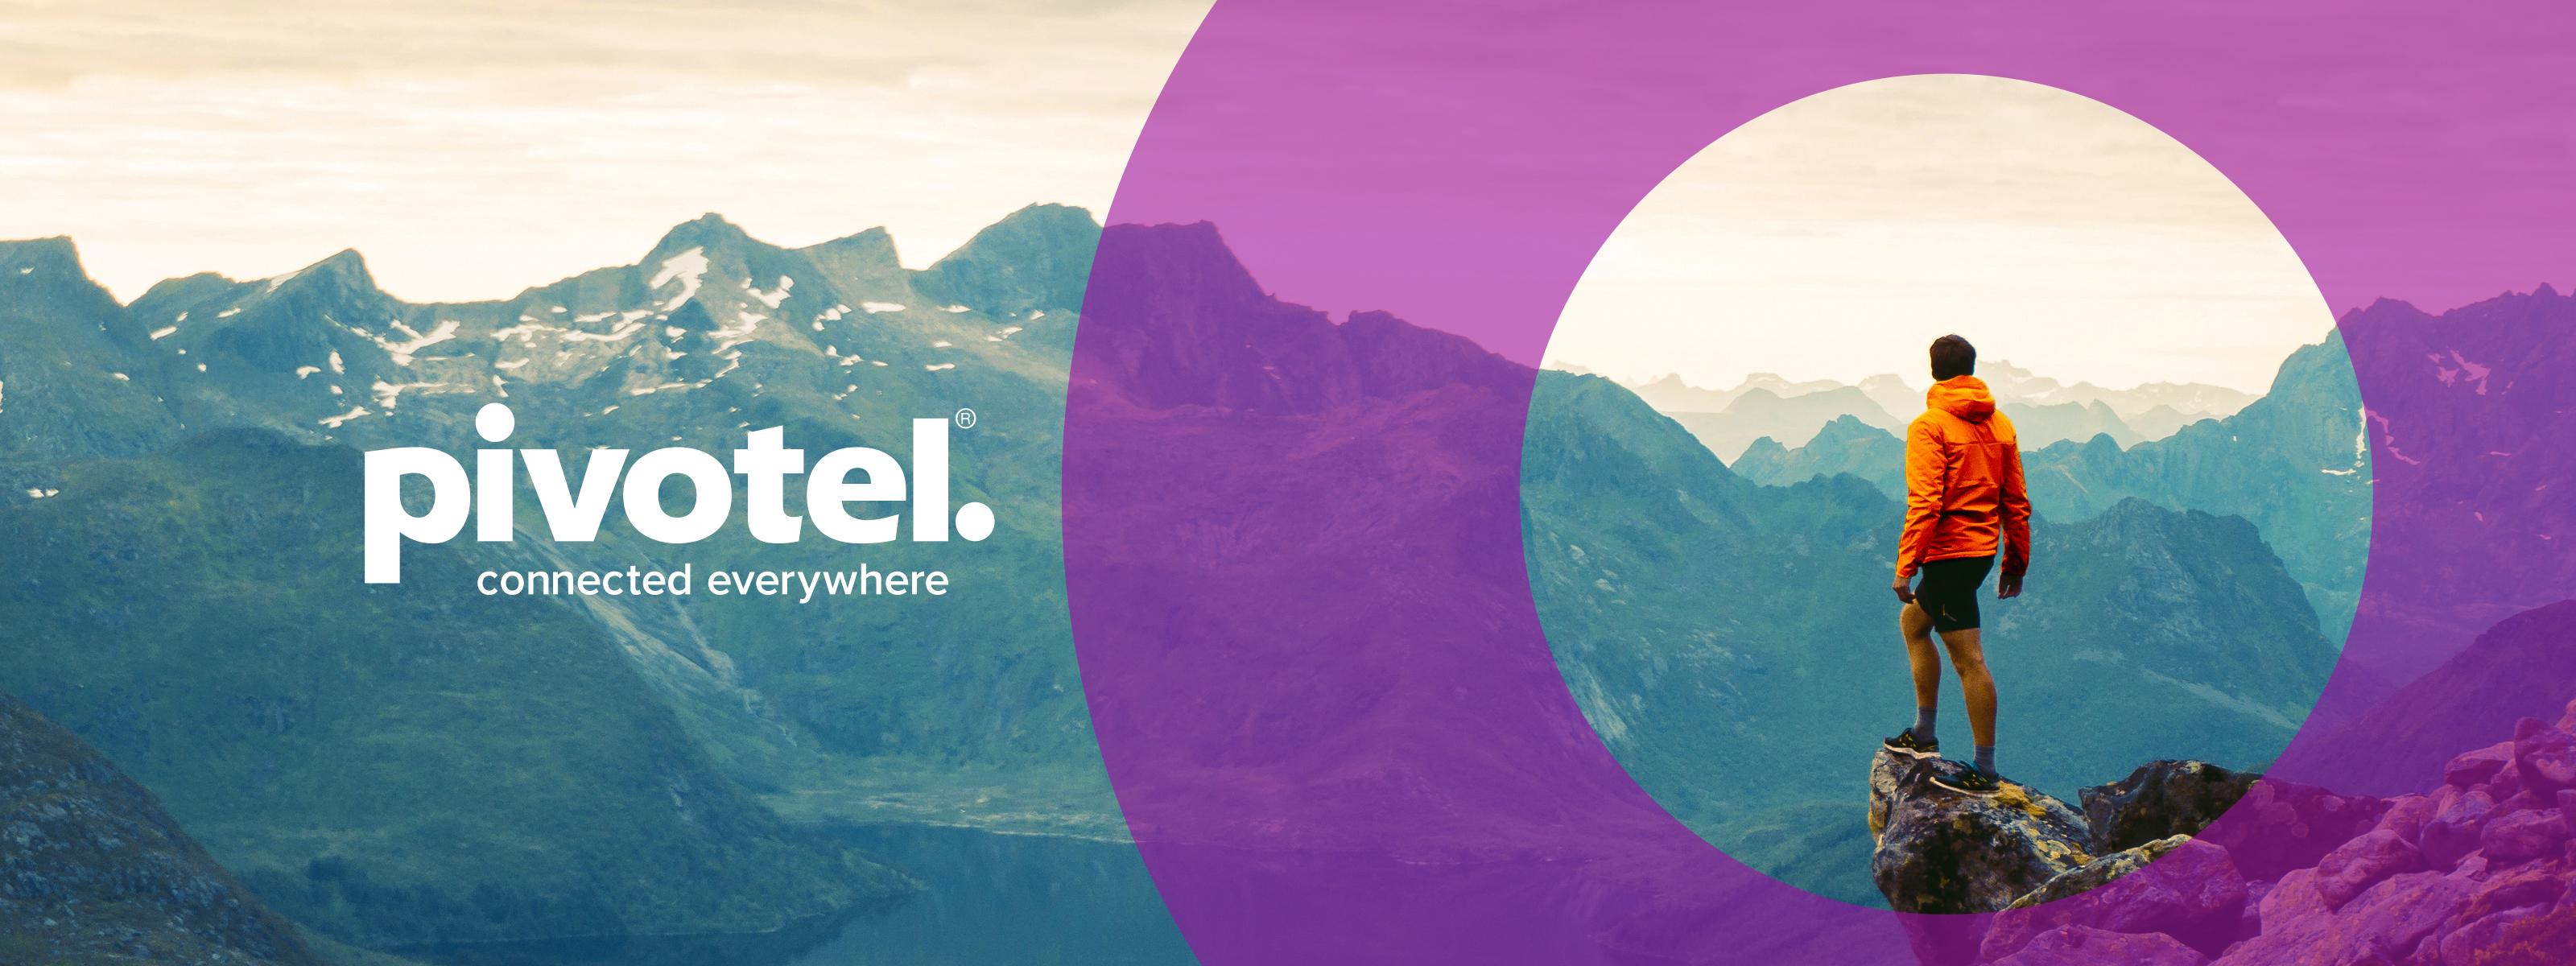 Pivotel_Man_Mountain_orange_jacket_purple_circle_Fin